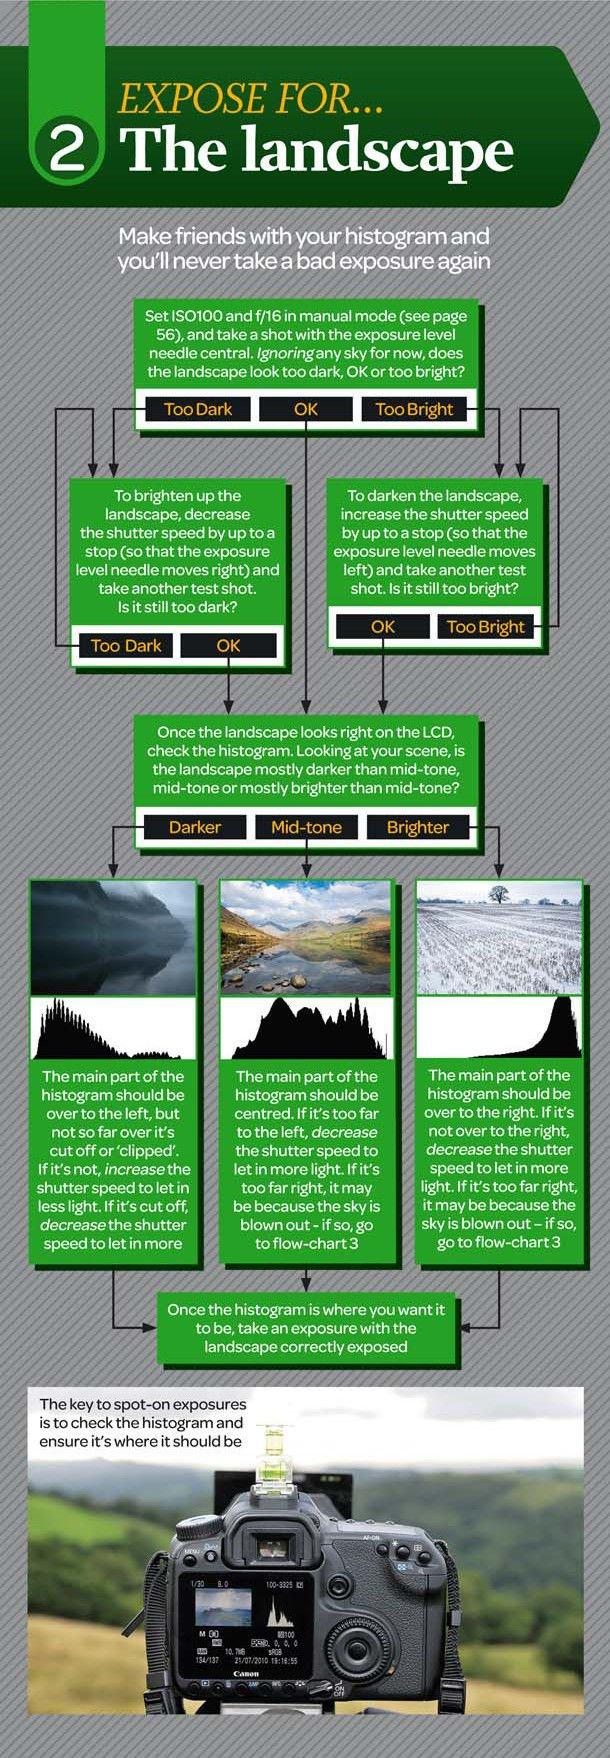 Menguasai Eksposure pada Fotografi Landscape